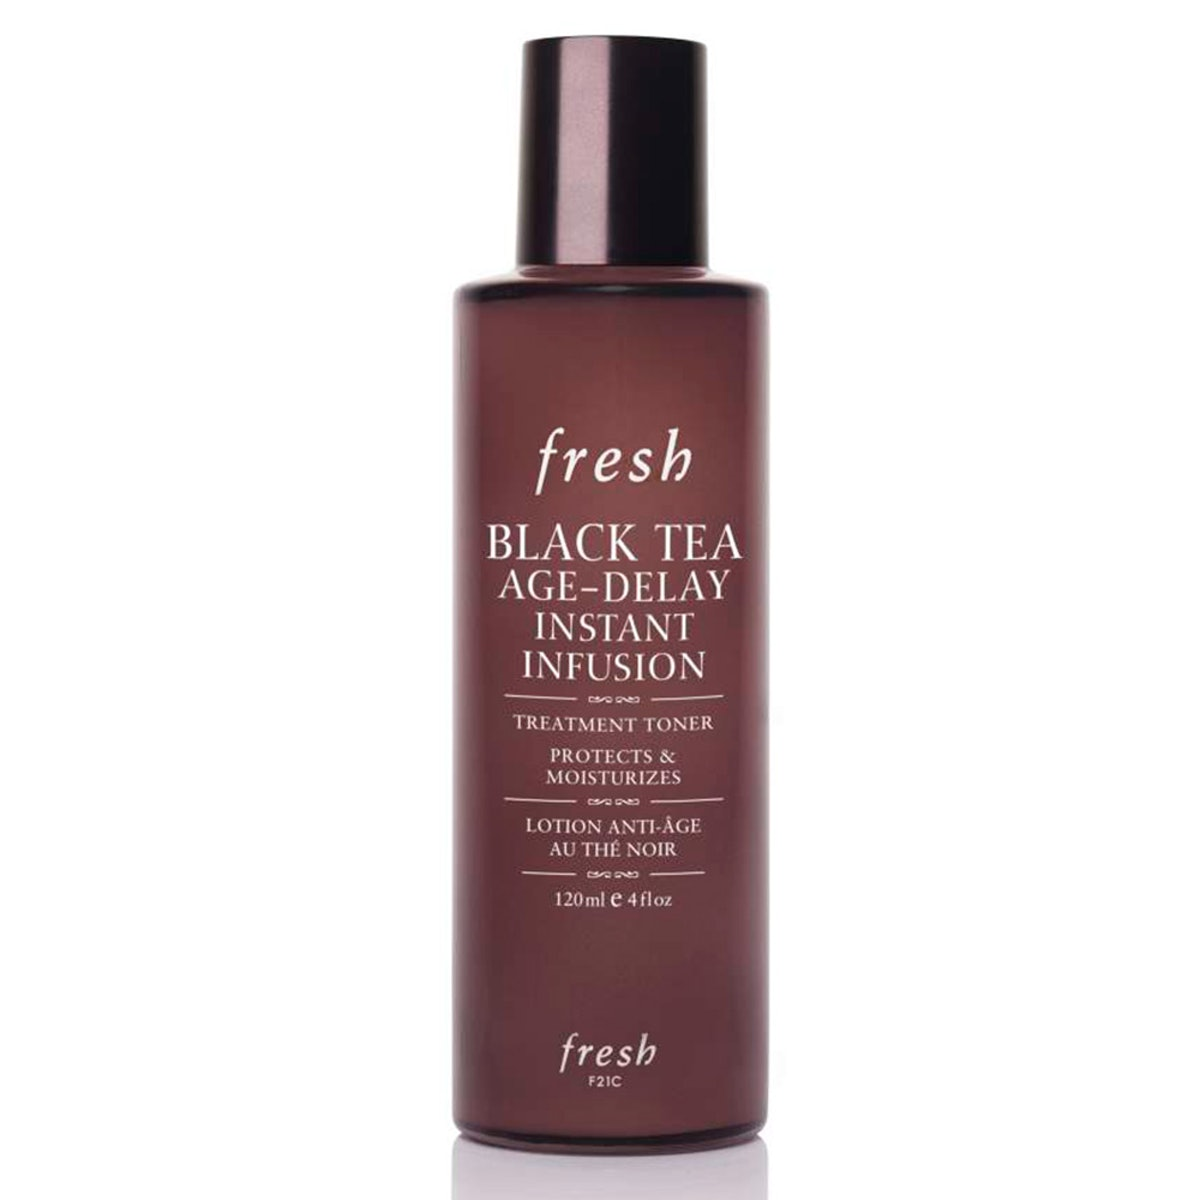 Fresh Black Tea Age-Delay Instant Infusion Treatment Toner